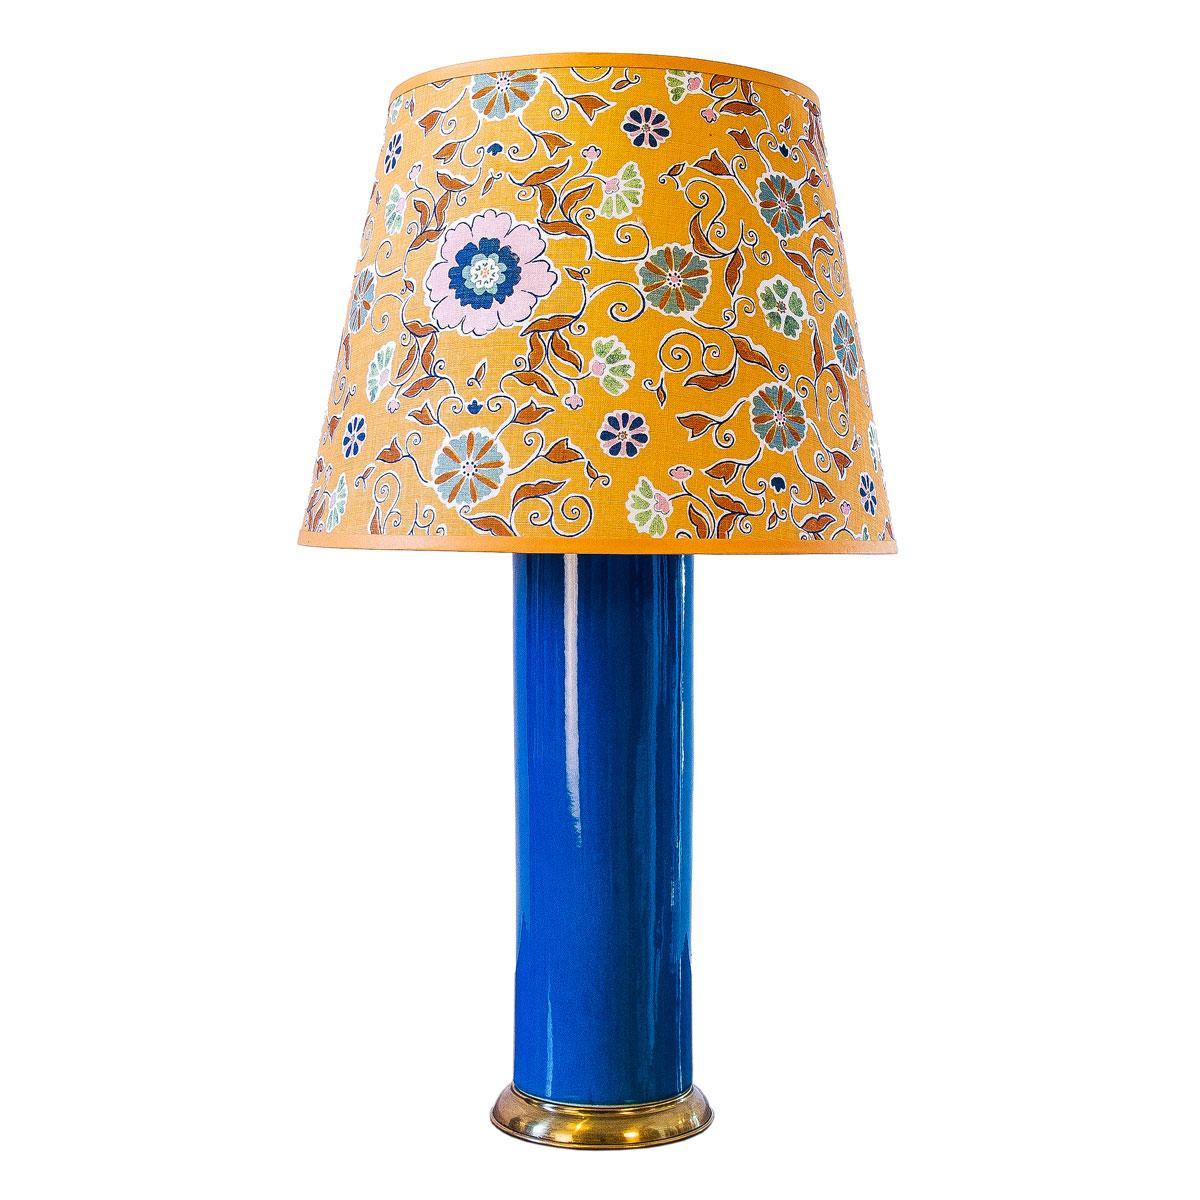 Tall Blue Ceramic Lamp & Shade